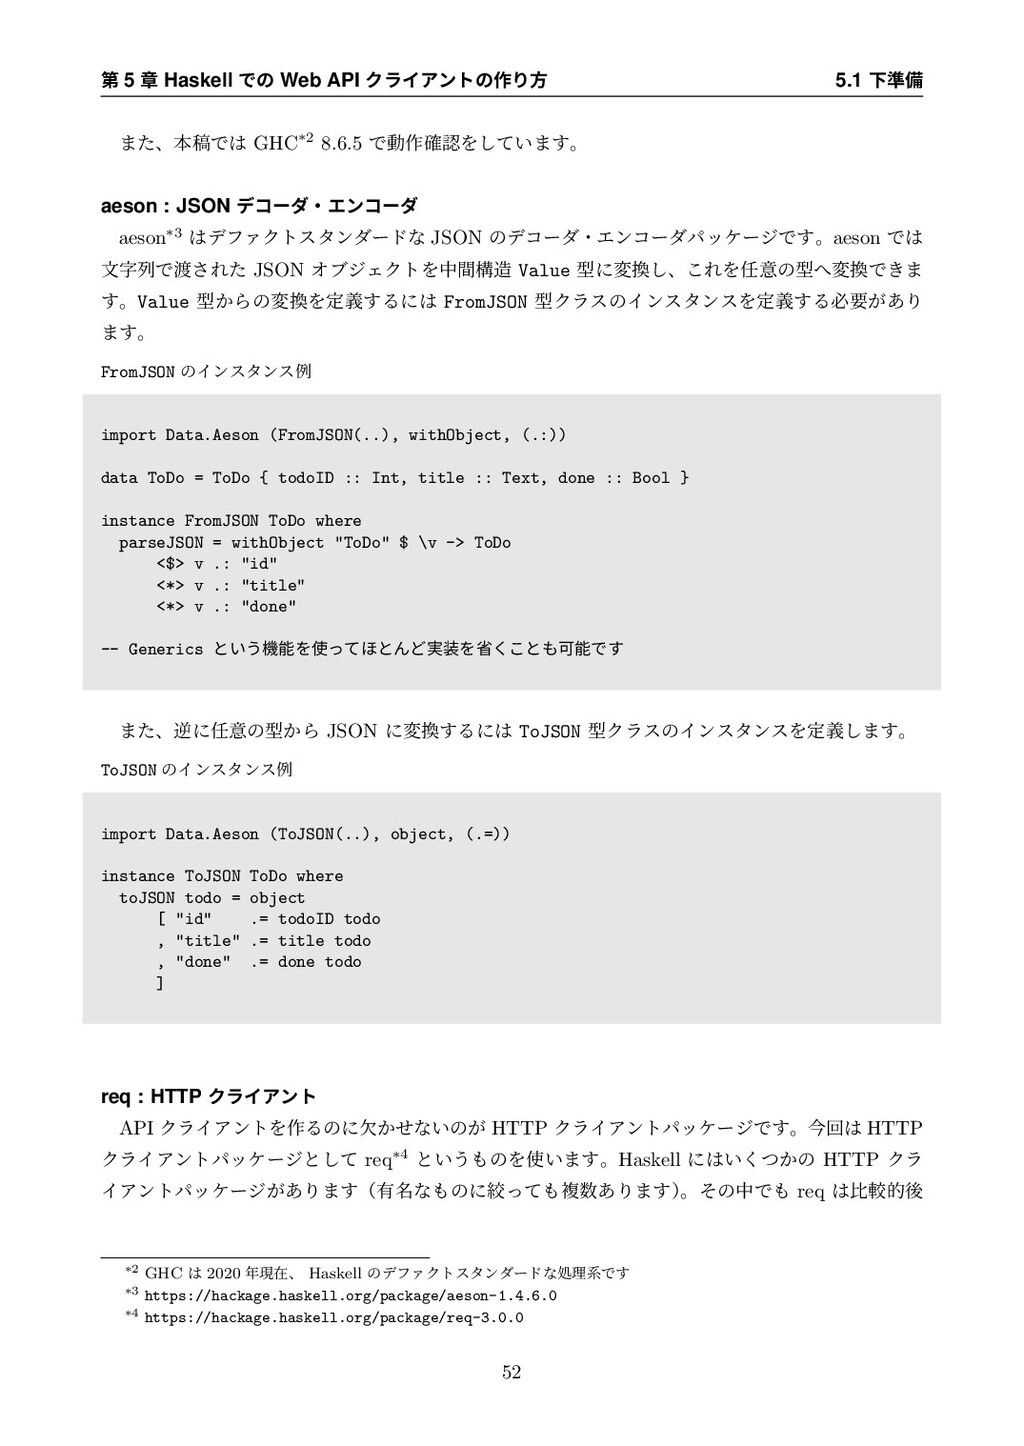 ୈ 5 ষ Haskell Ͱͷ Web API ΫϥΠΞϯτͷ࡞Γํ 5.1 Լ४උ ·ͨɺ...